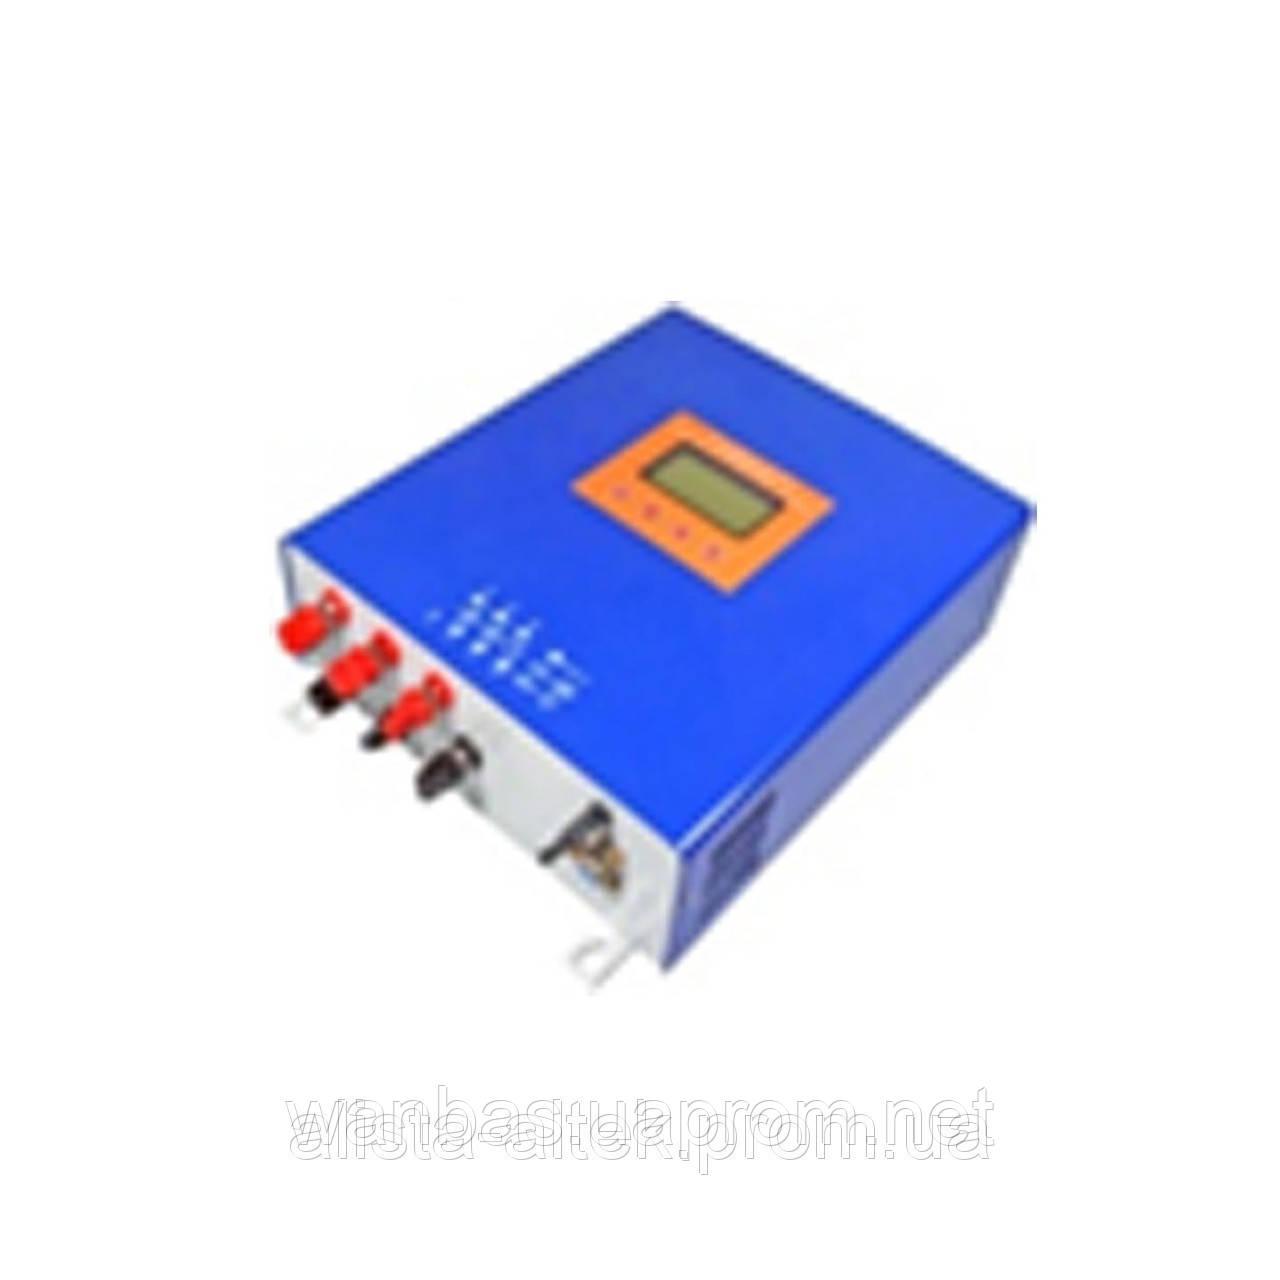 Контроллер заряда аккумуляторных батарей для солнечных модулей Altek AeMPPT6024Z